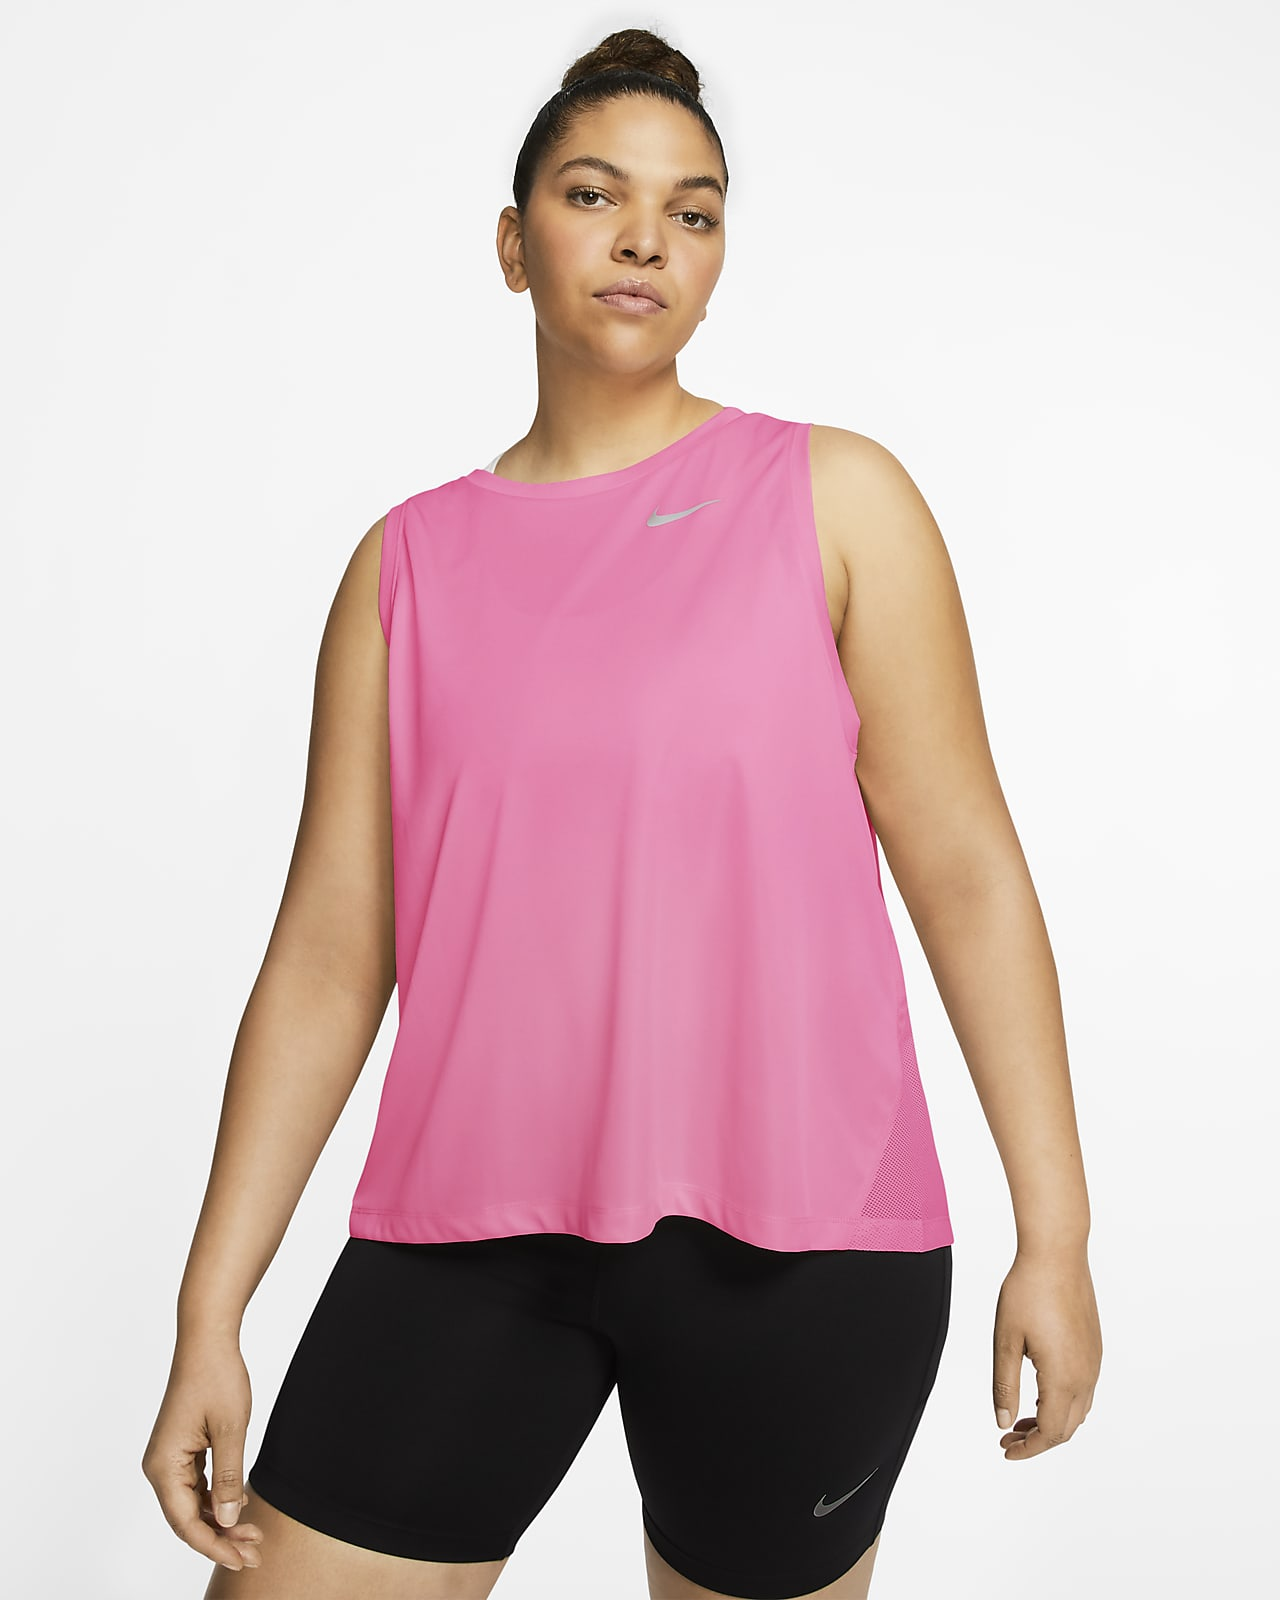 Débardeur de running Nike Miler pour Femme (grande taille)